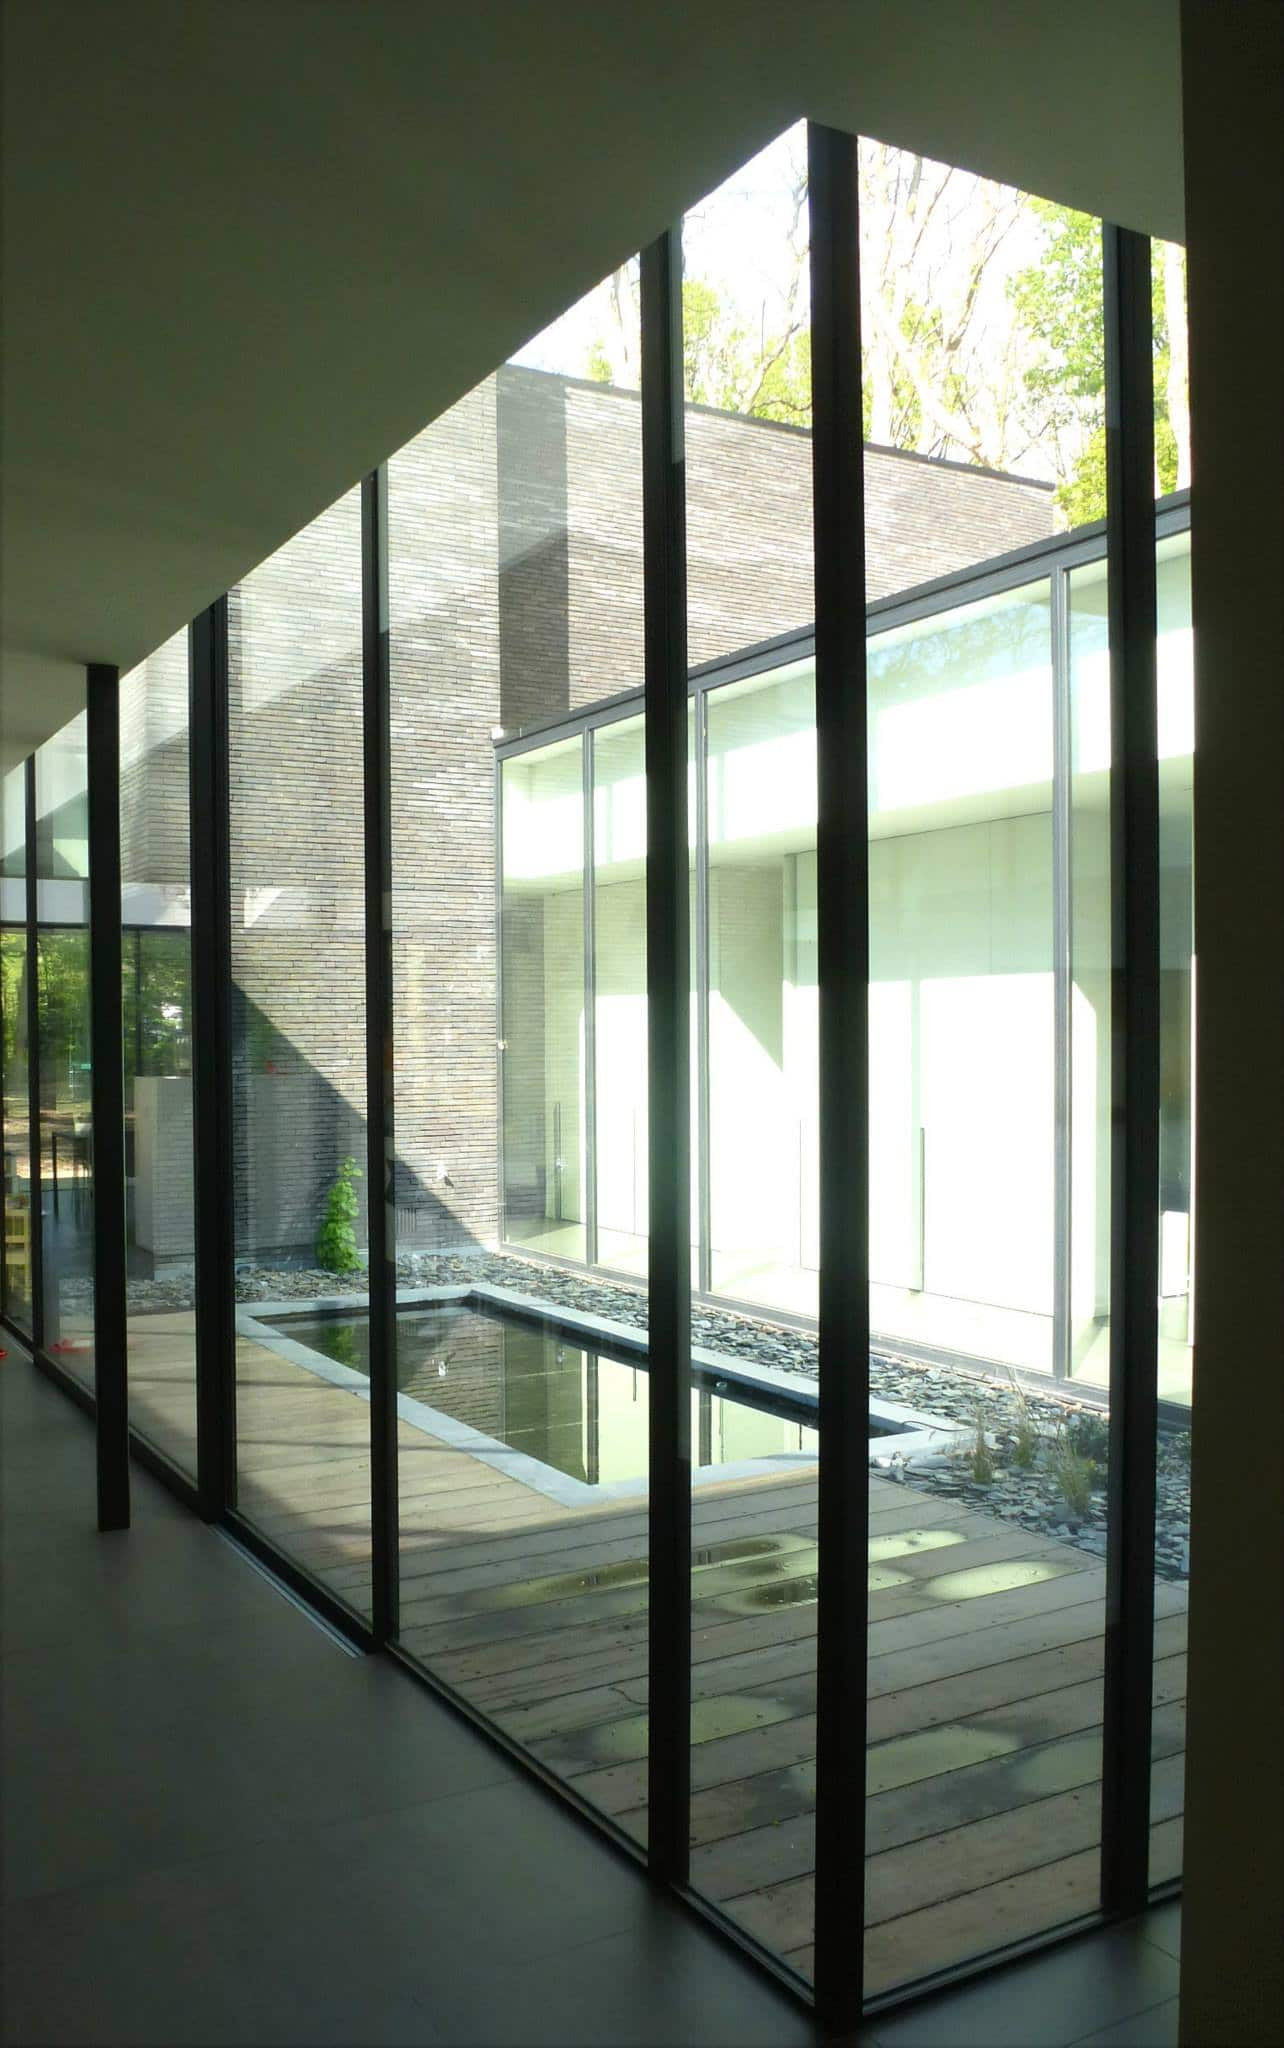 10257977 628030907274787 5636004923849968878 o | Baeyens & Beck architecten Gent | architect nieuwbouw renovatie interieur | high end | architectenbureau